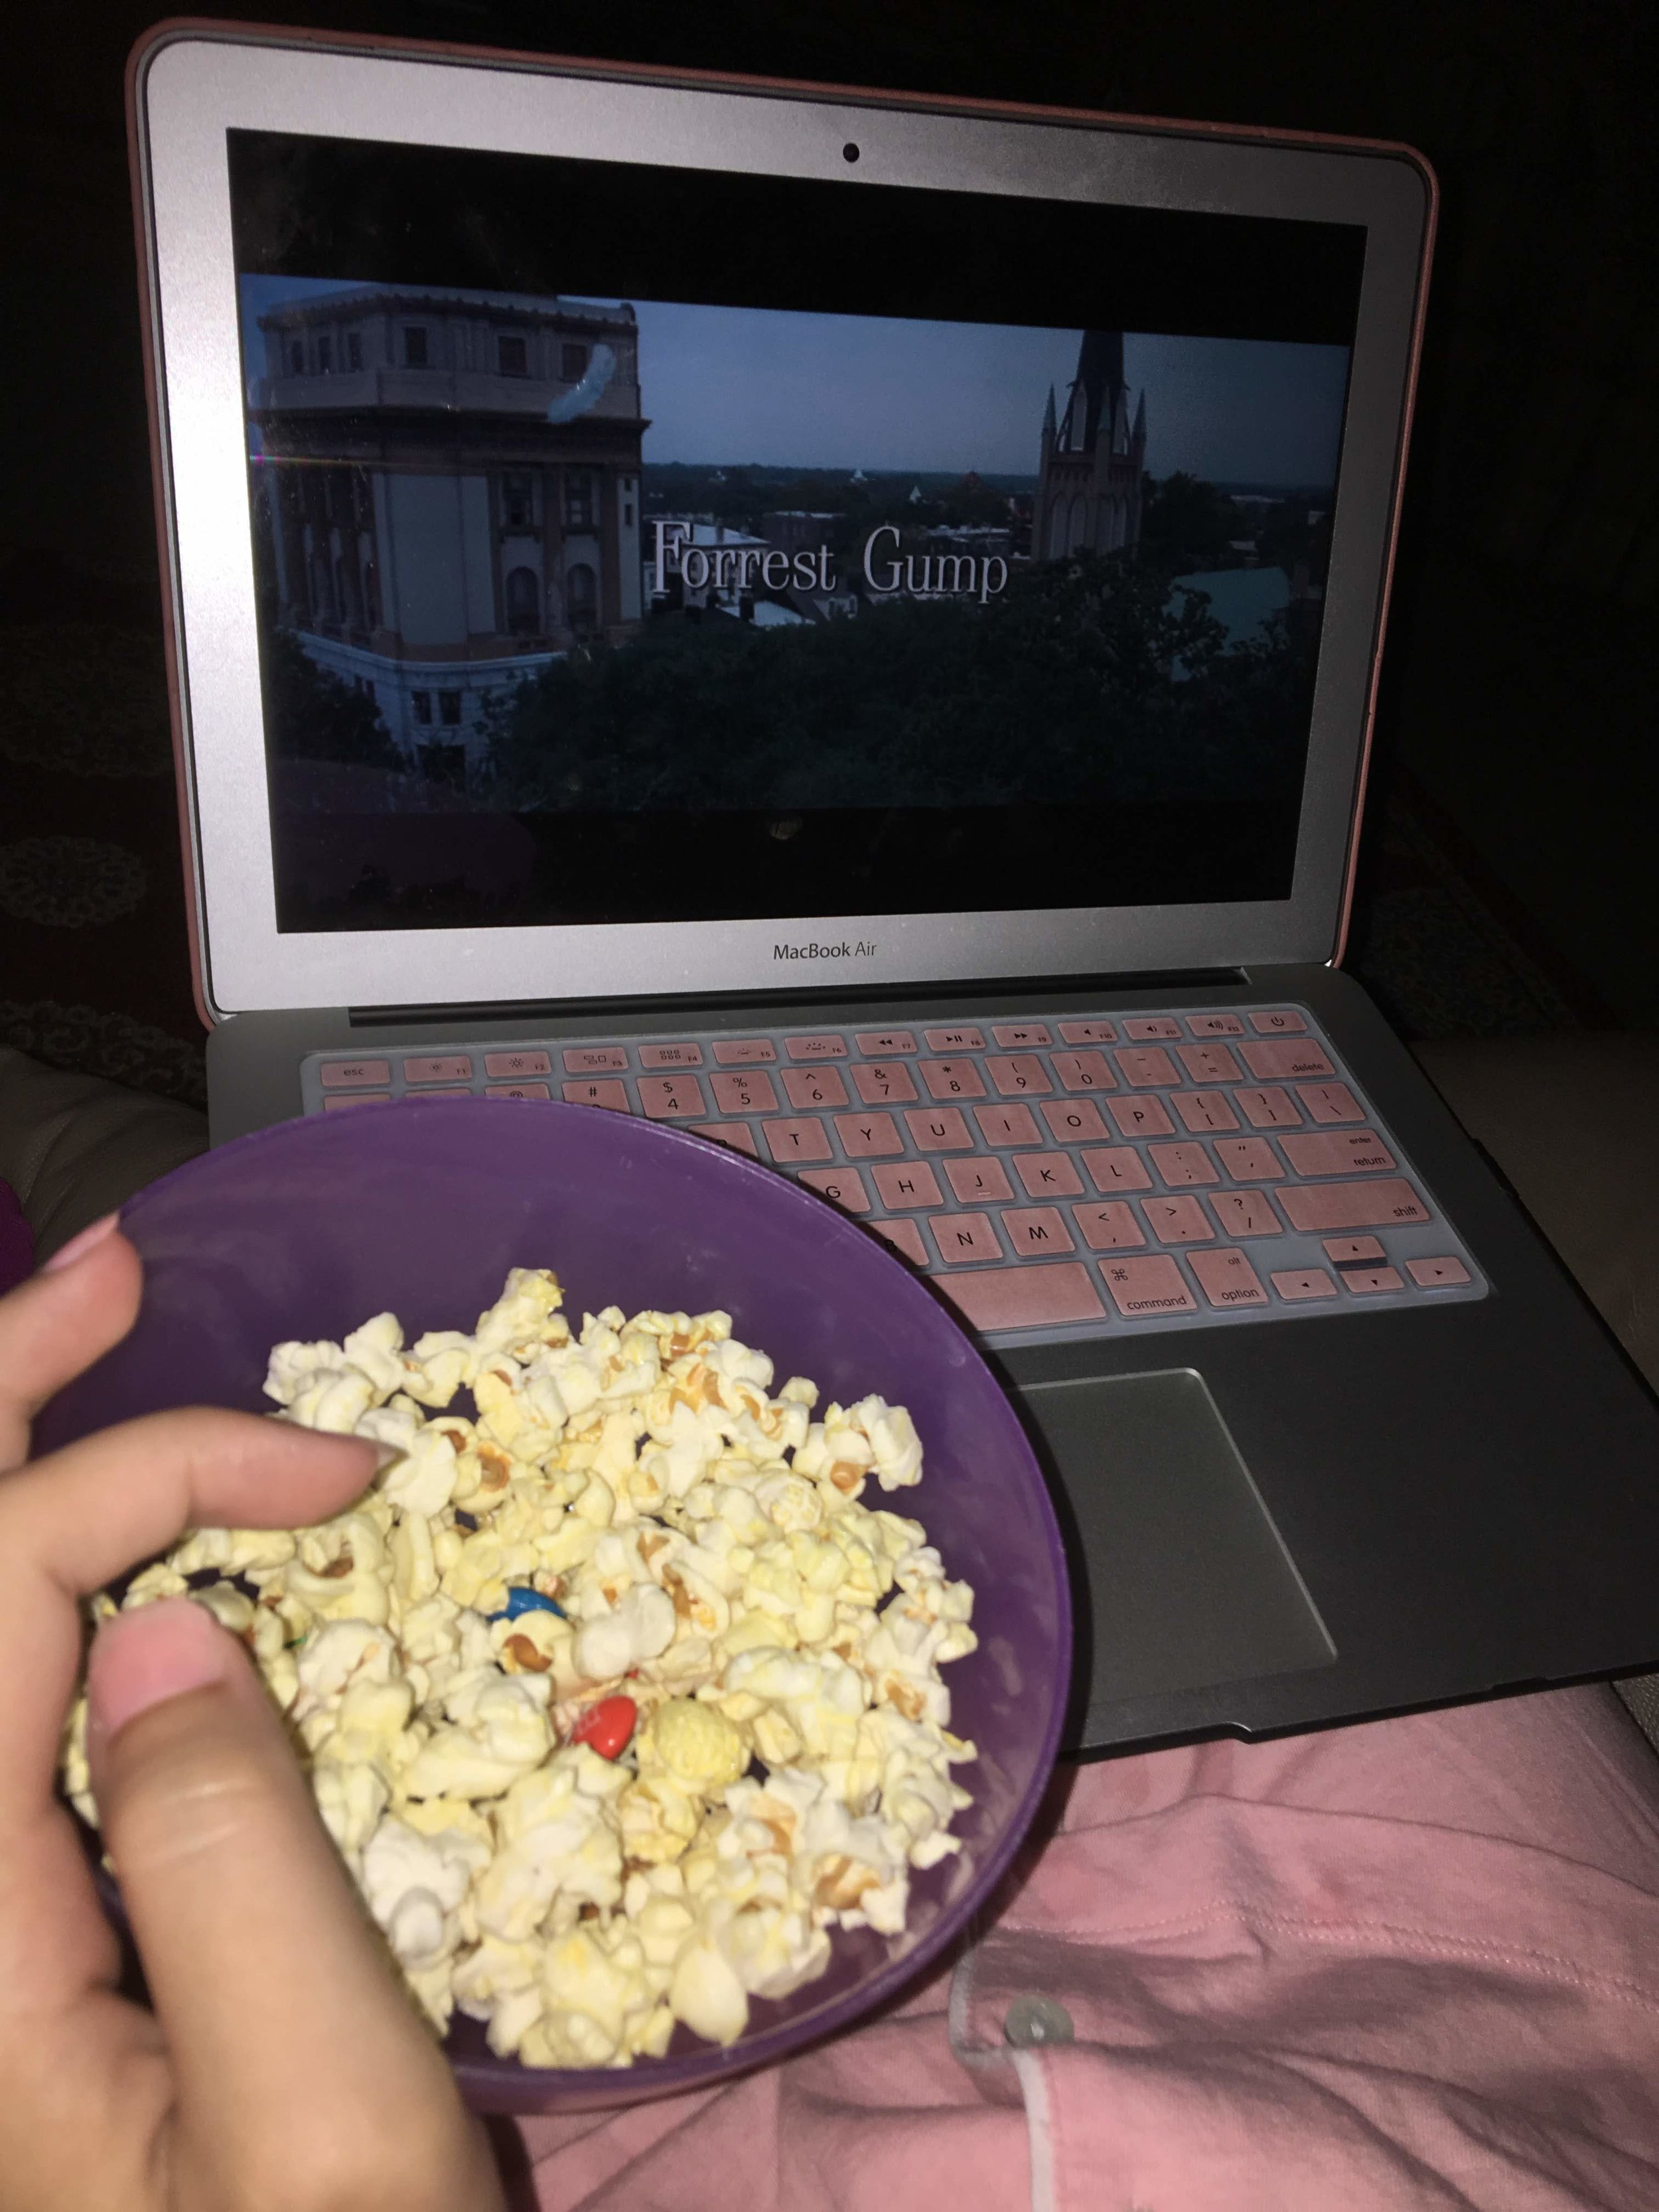 forrest-gump-laptop-popcorn.jpg